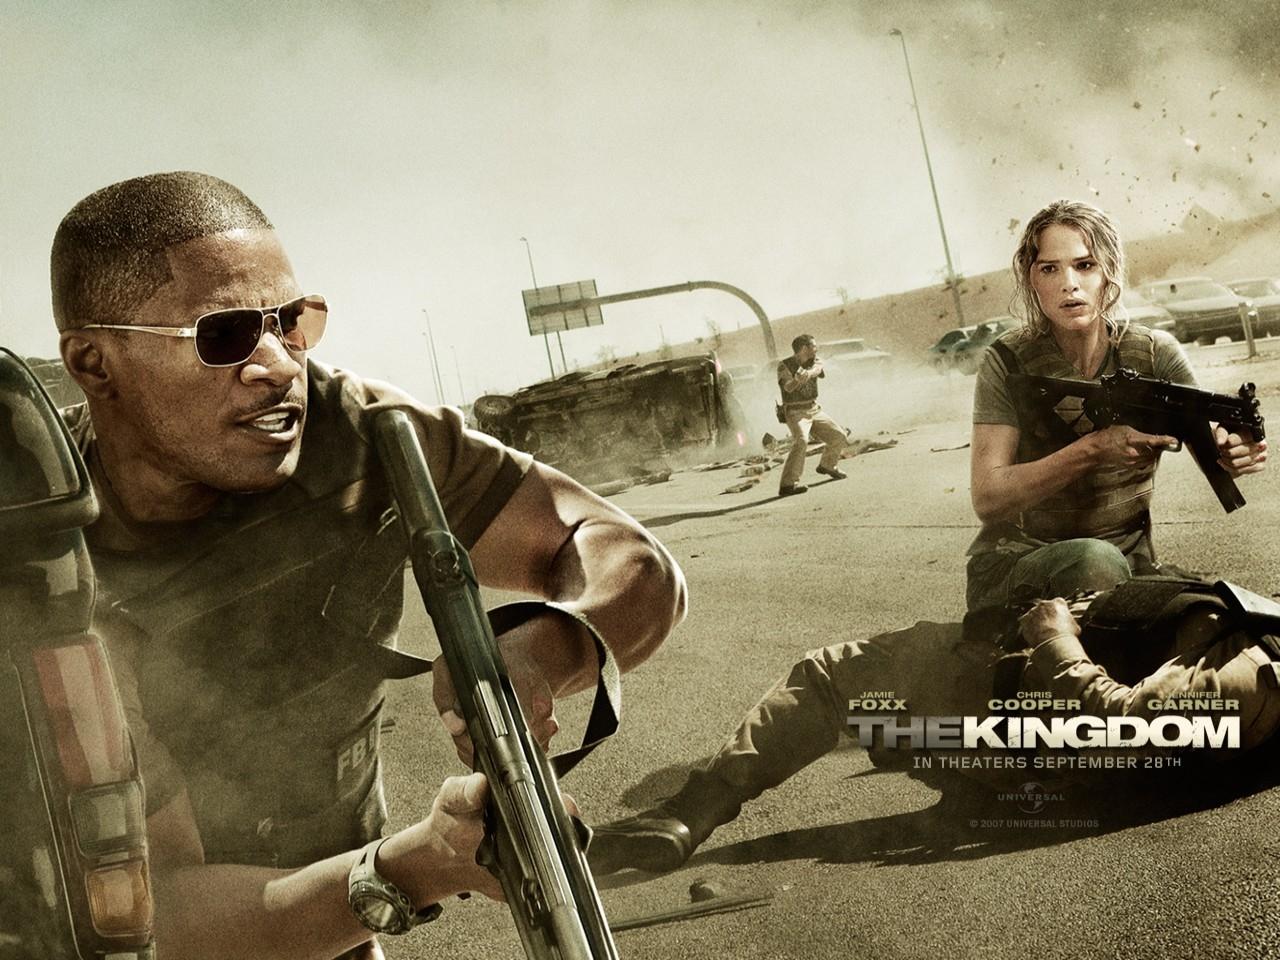 Wallpaper del film The Kingdom